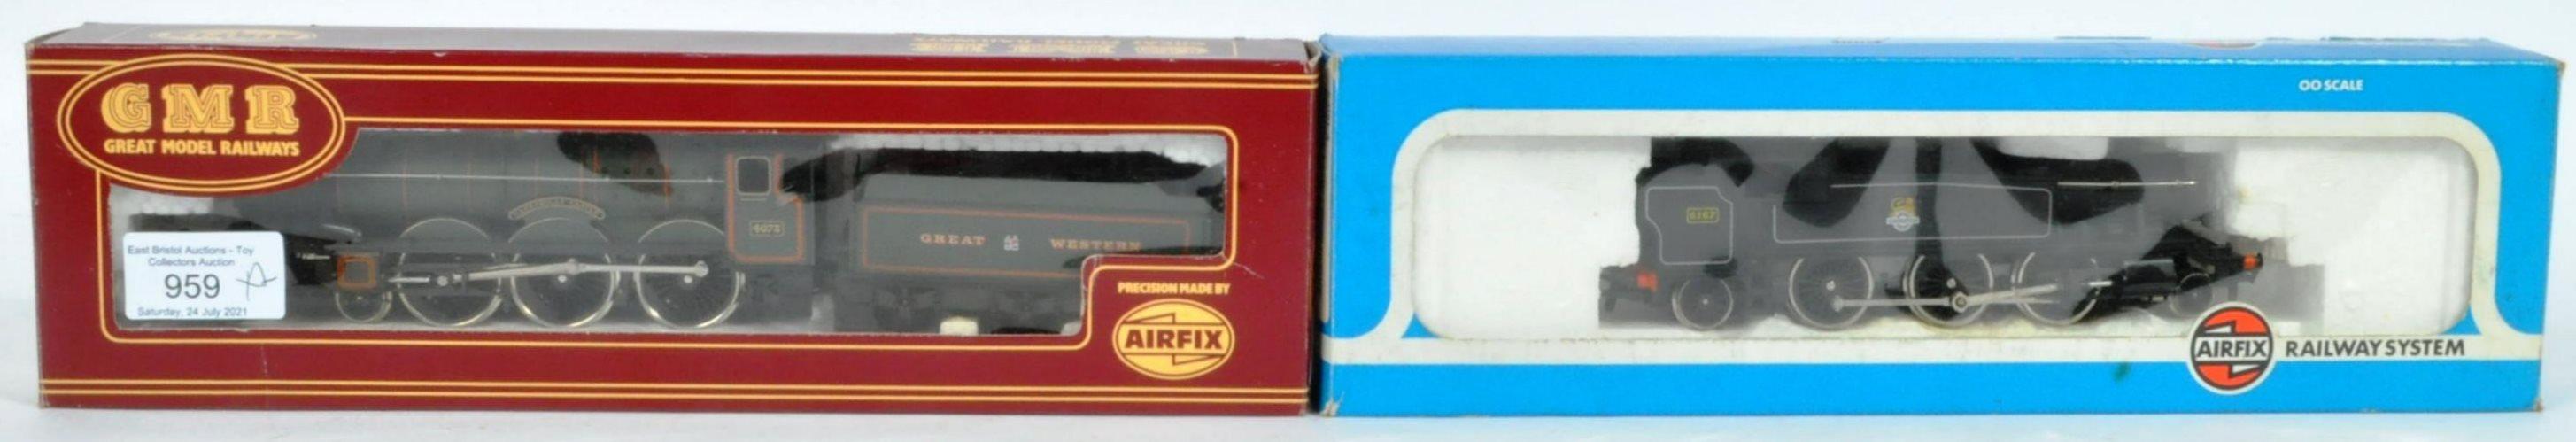 TWO ORIGINAL AIRFIX 00 GAUGE MODEL RAILWAY TRAINSET LOCOMOTIVES